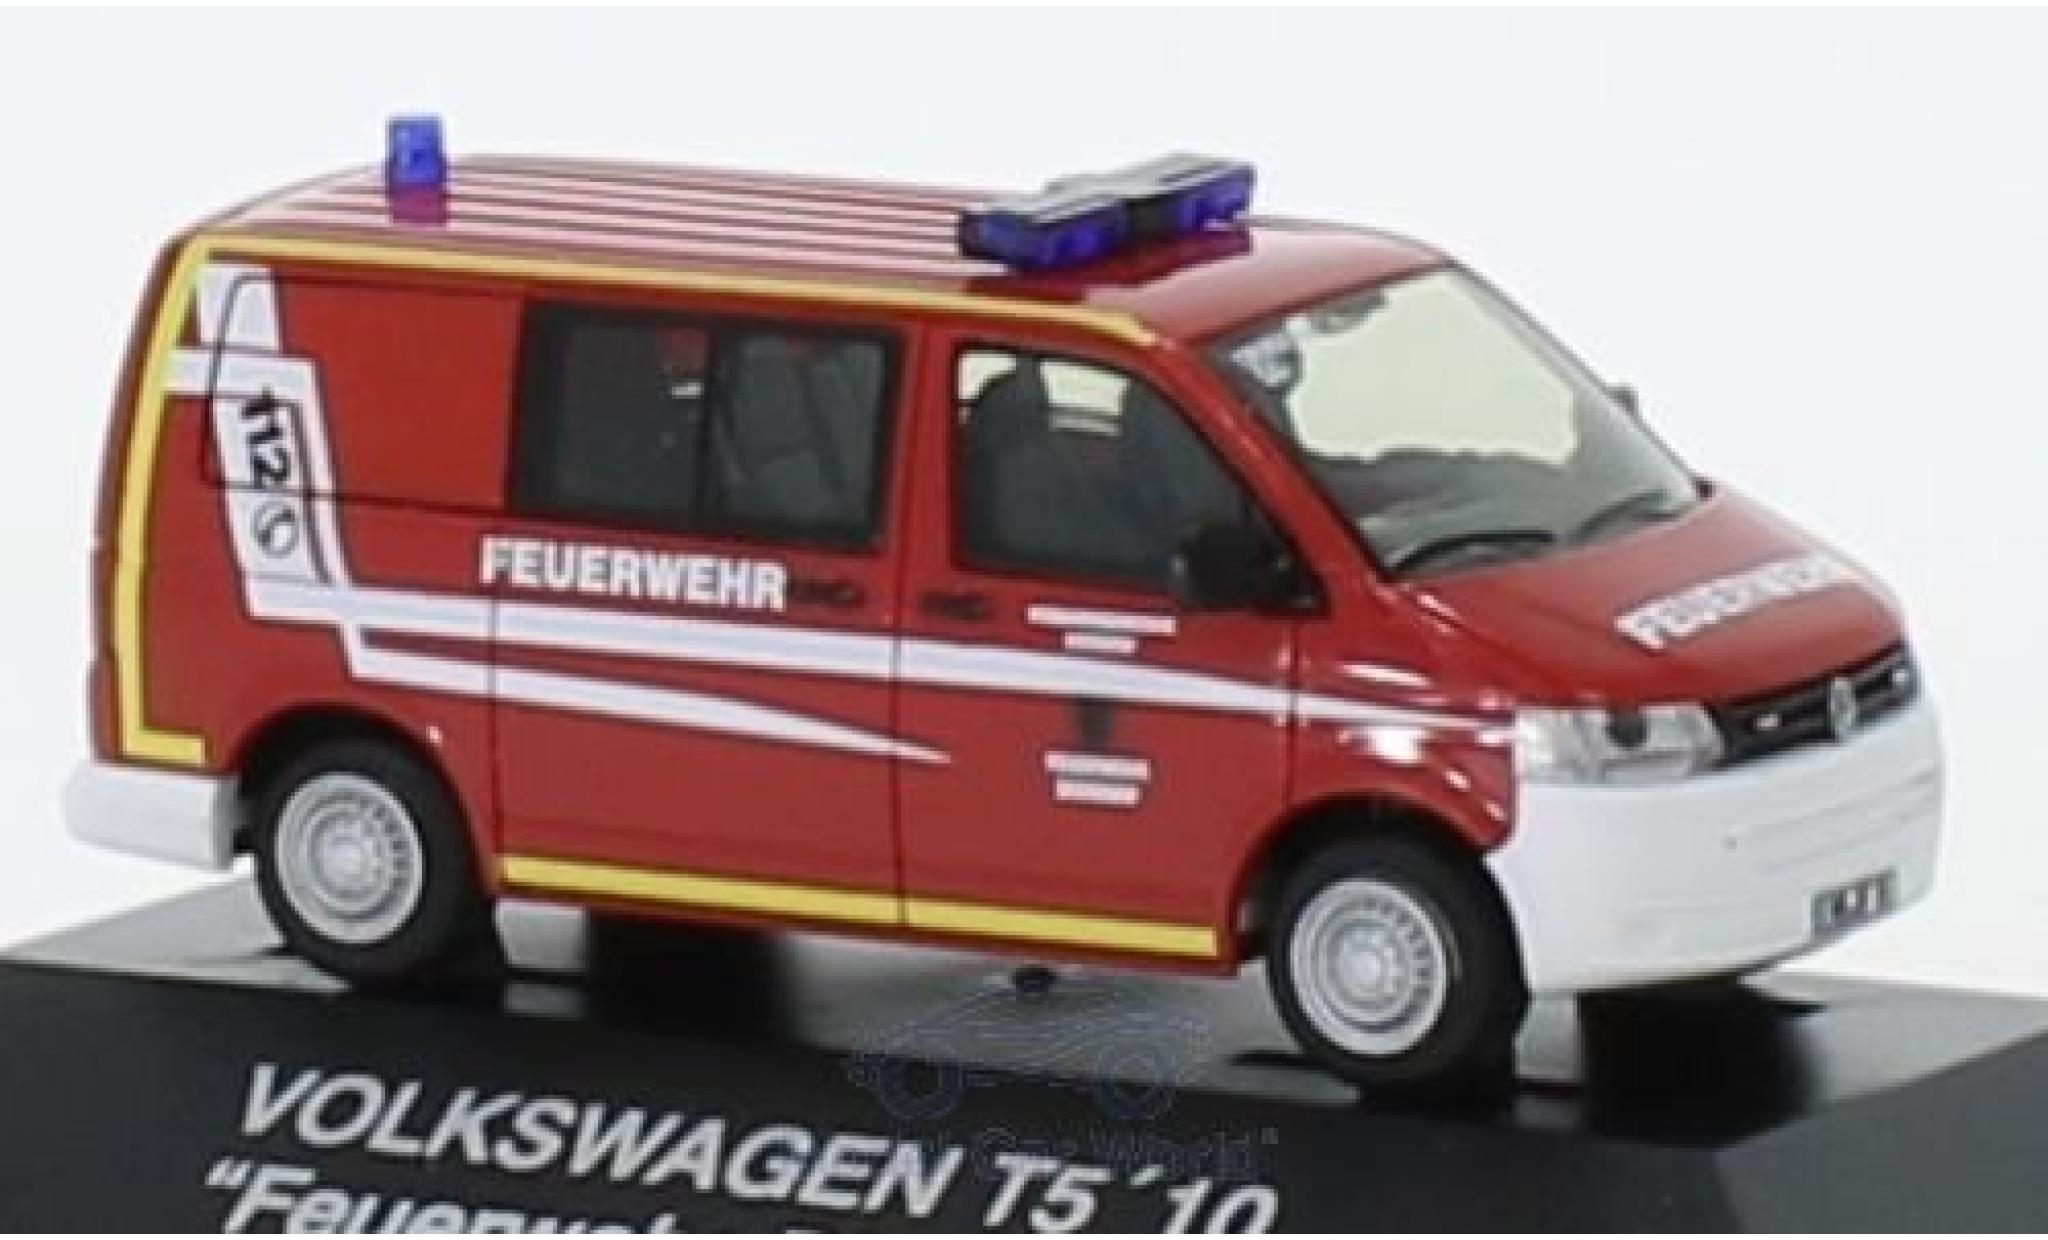 Volkswagen T5 1/87 Rietze Halbbus Feuerwehr Dierdorf 2010